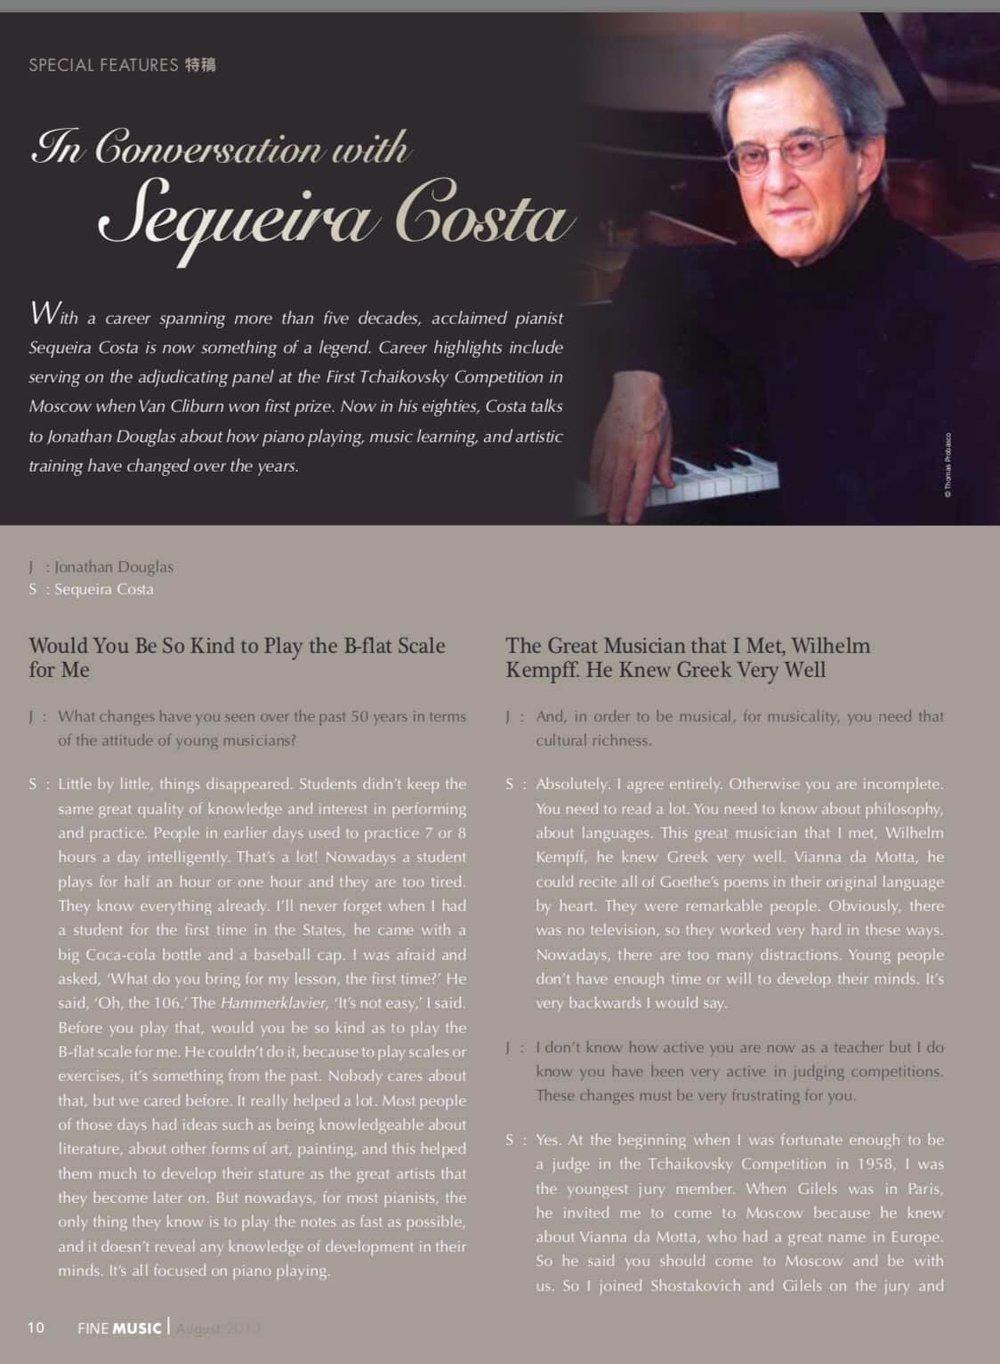 Sequeira Costa transcription 1.jpg